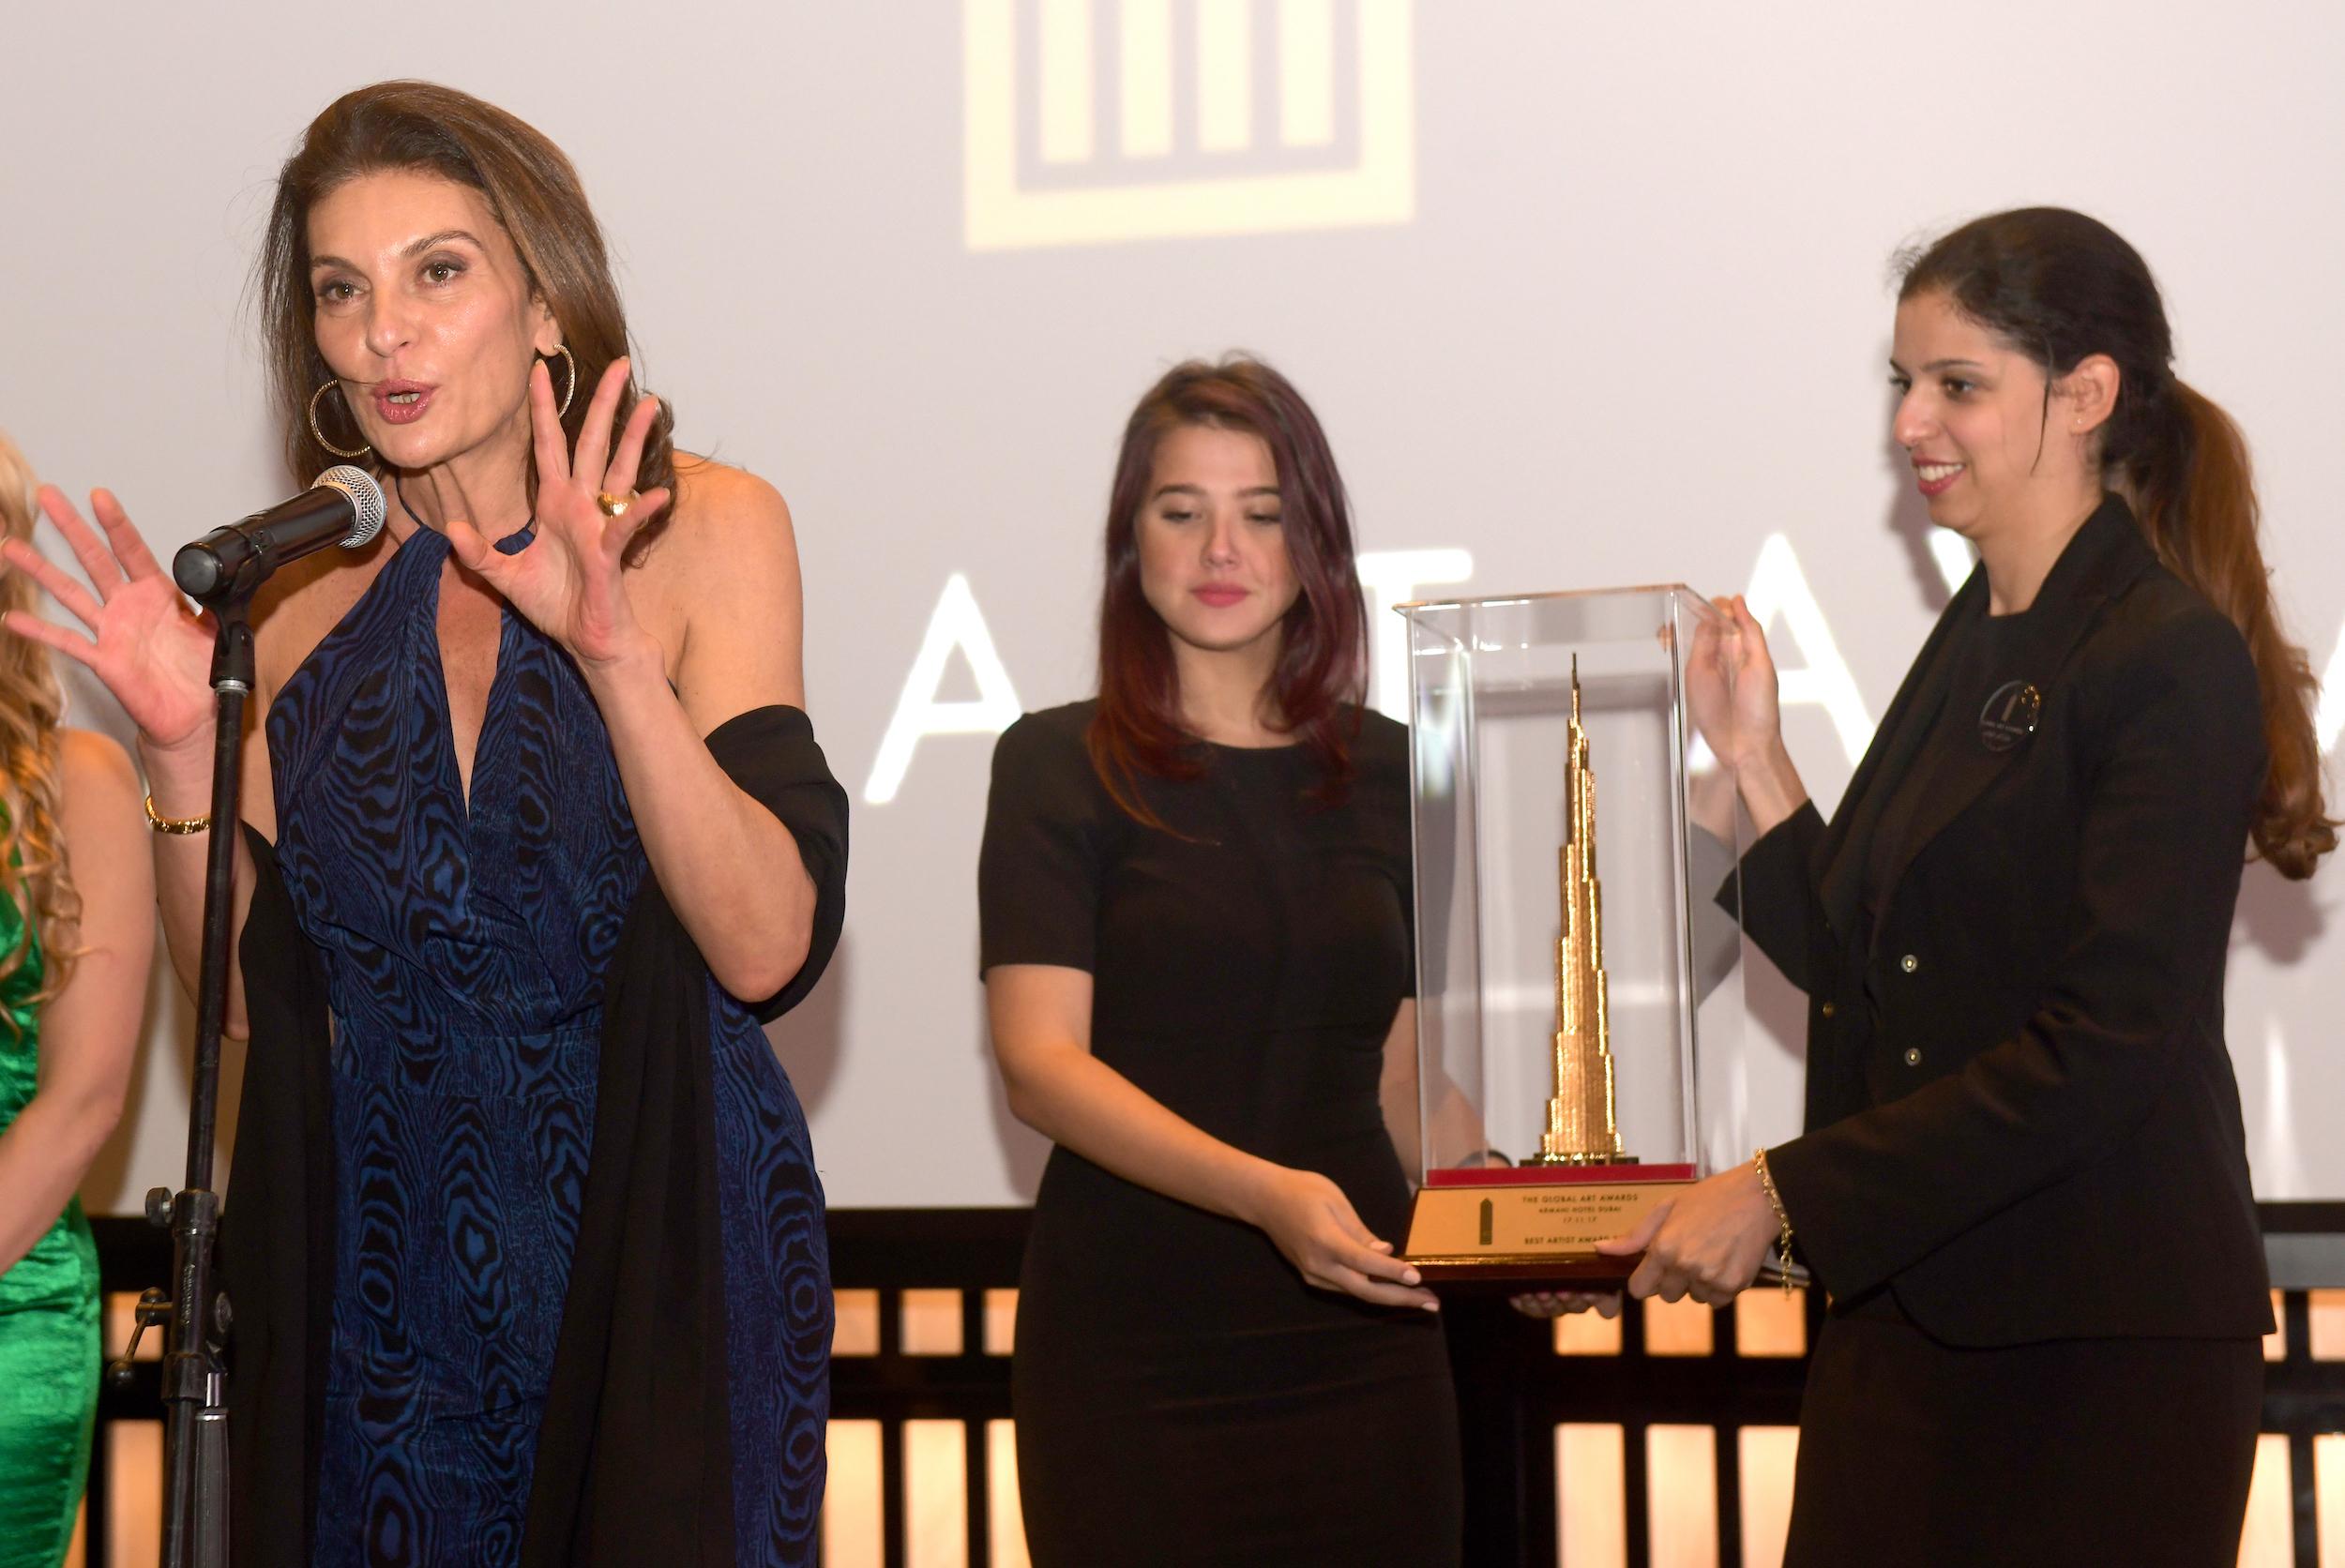 BEST GLOBAL ARTIST AWARD   NJA MAHDAOUI (TUNISIA)